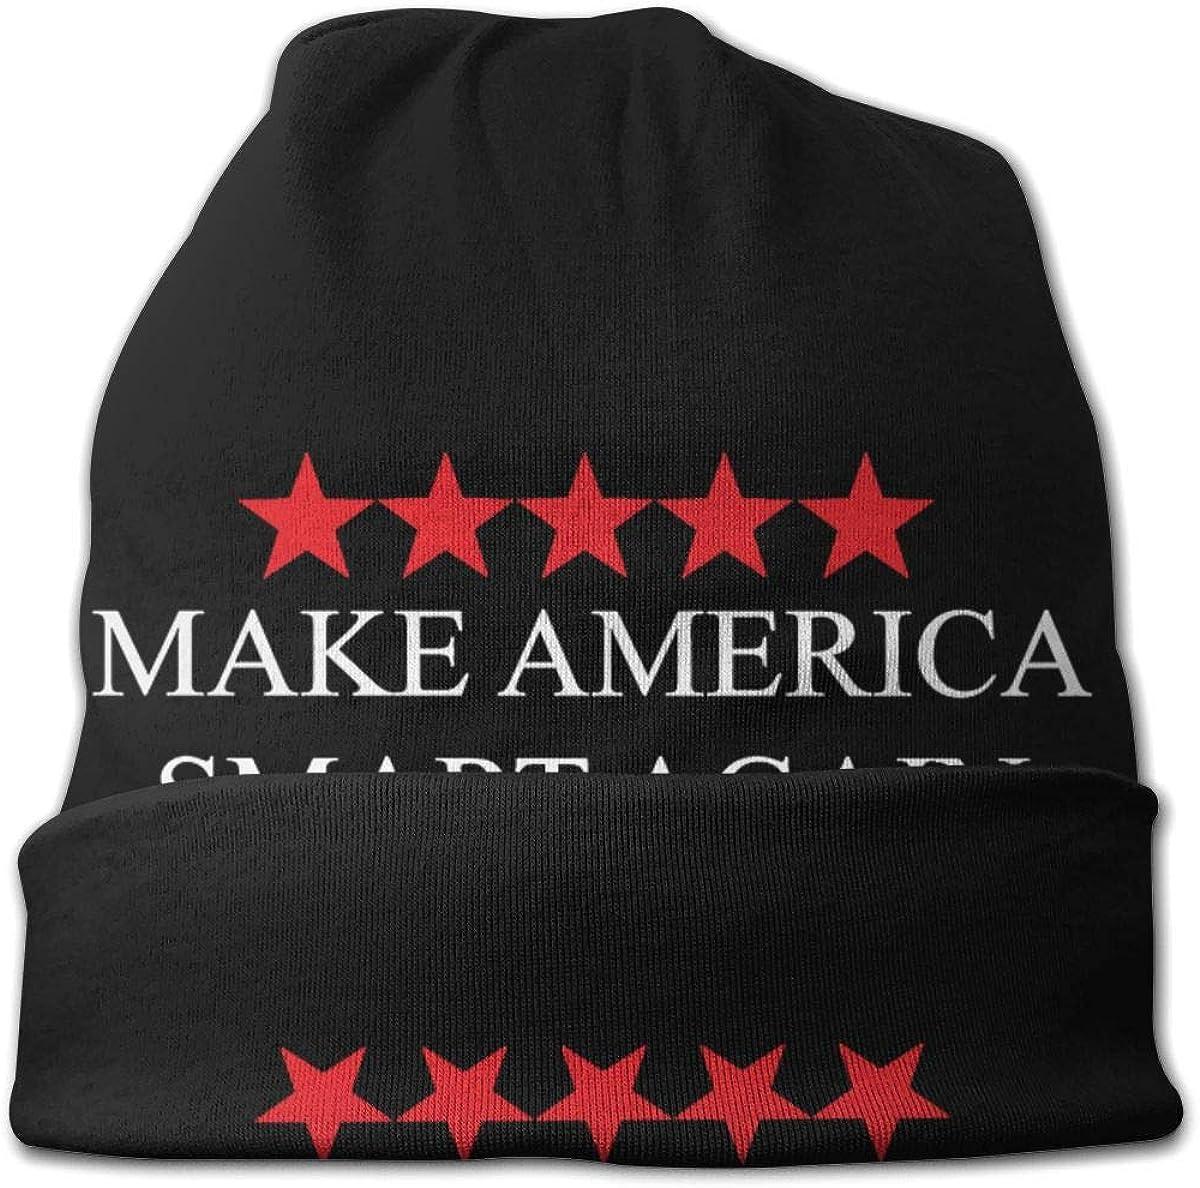 JINGUImao Make America Smart Again Unisex Warm Hat Knit Hat Skull Cap Beanies Cap